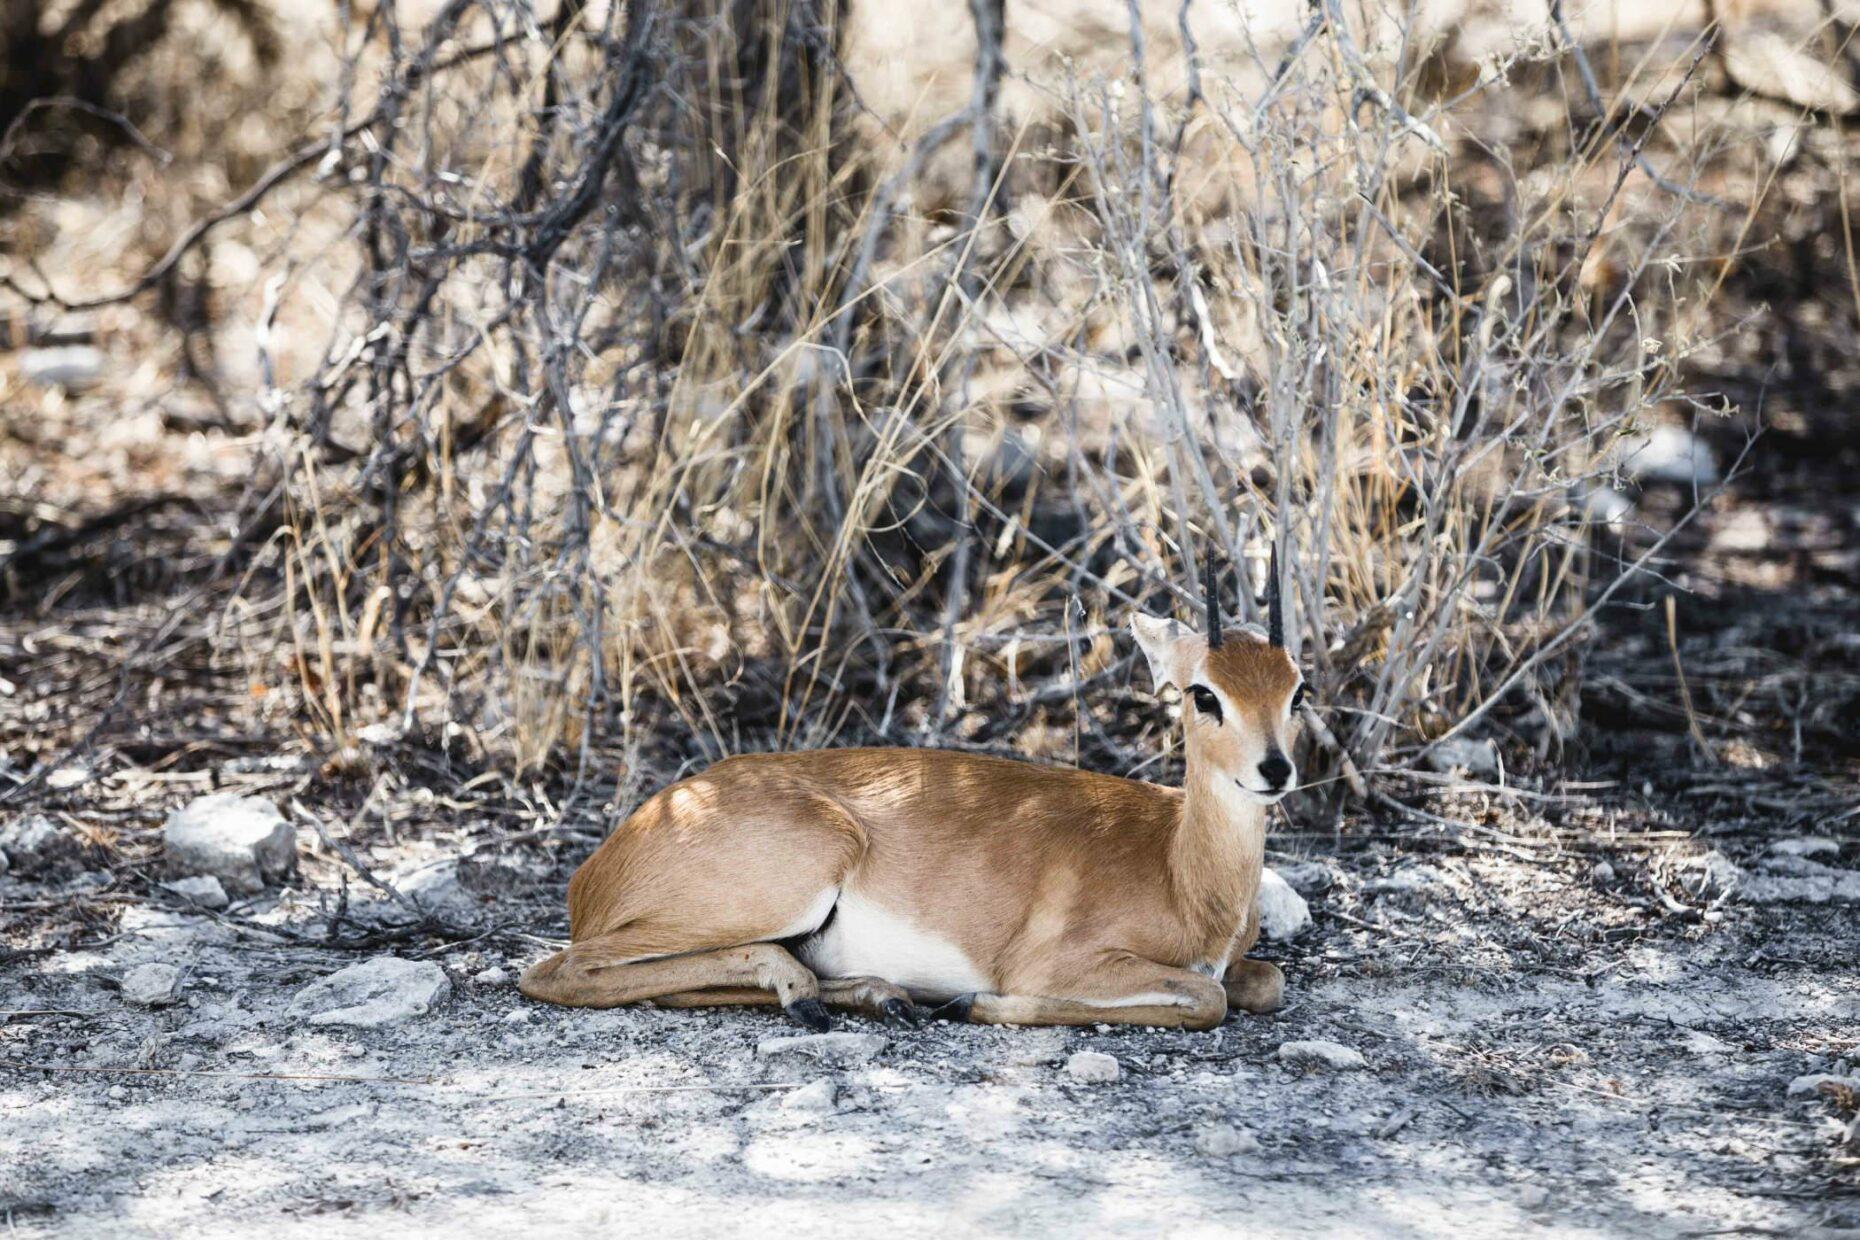 dikdik-in-namibia-savannah